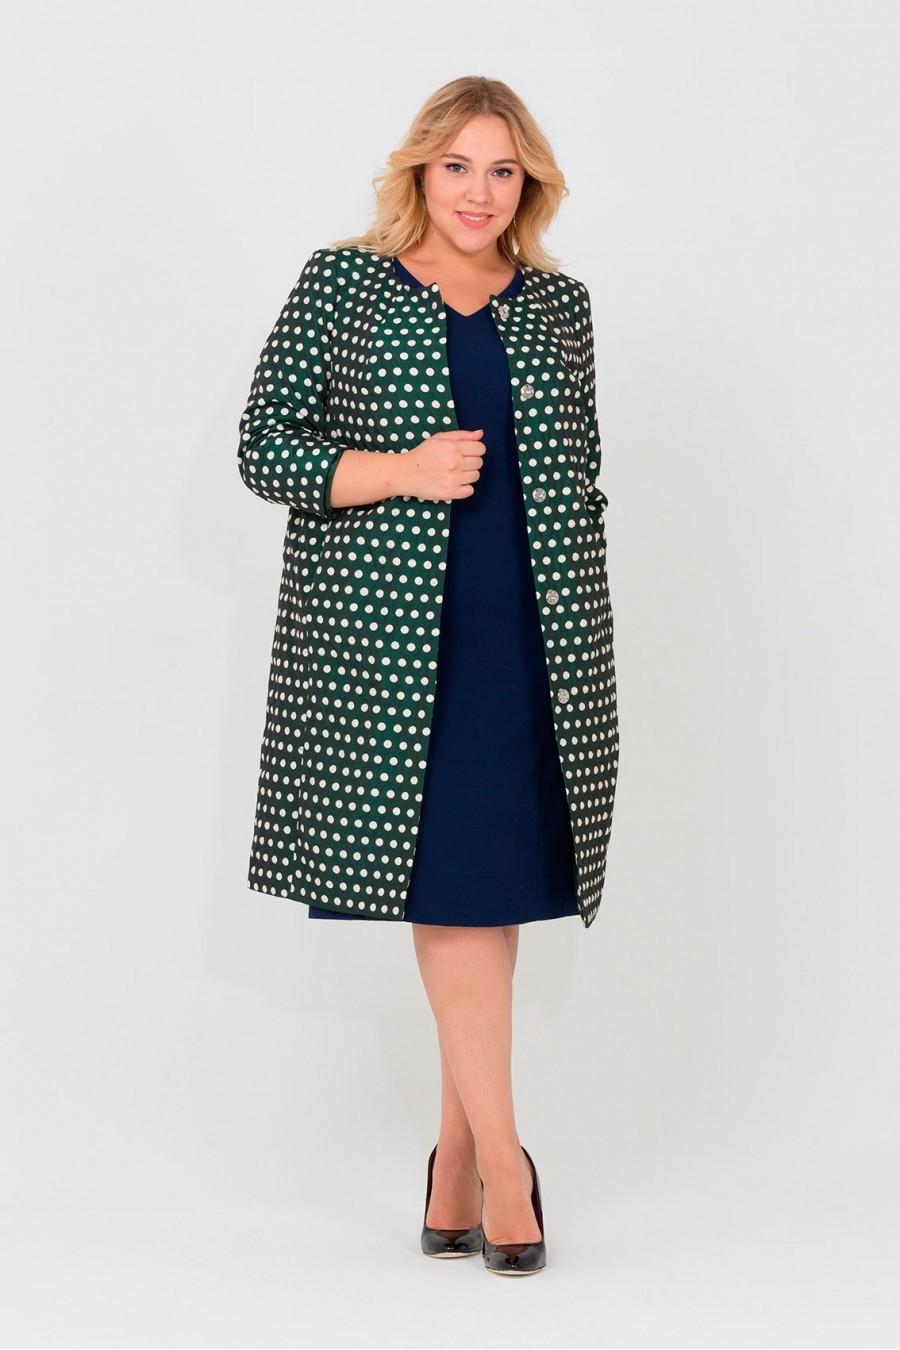 Верхняя одежда Пальто Горох зеленый 2-900x1350.jpg